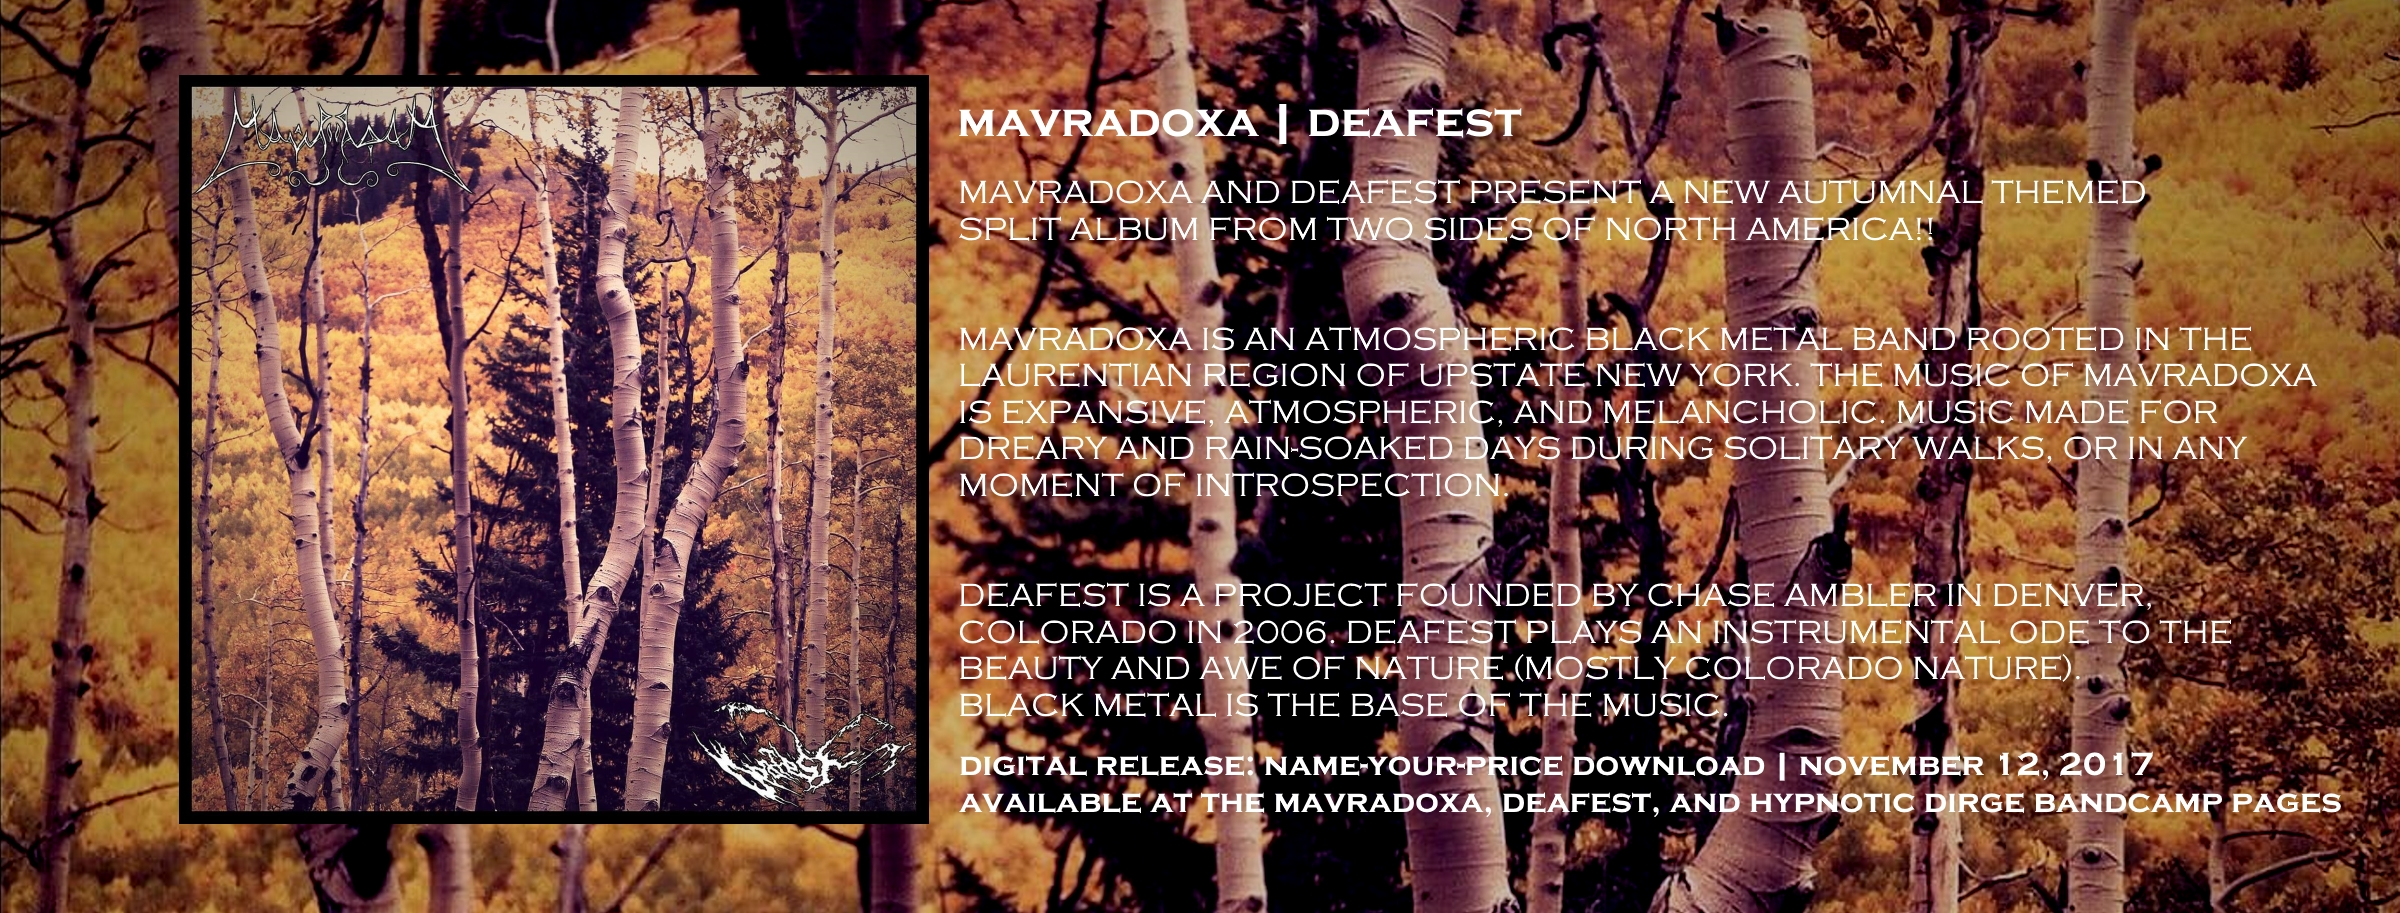 DIGITAL ALBUM RELEASE: Mavradoxa   Deafest [Split Album]